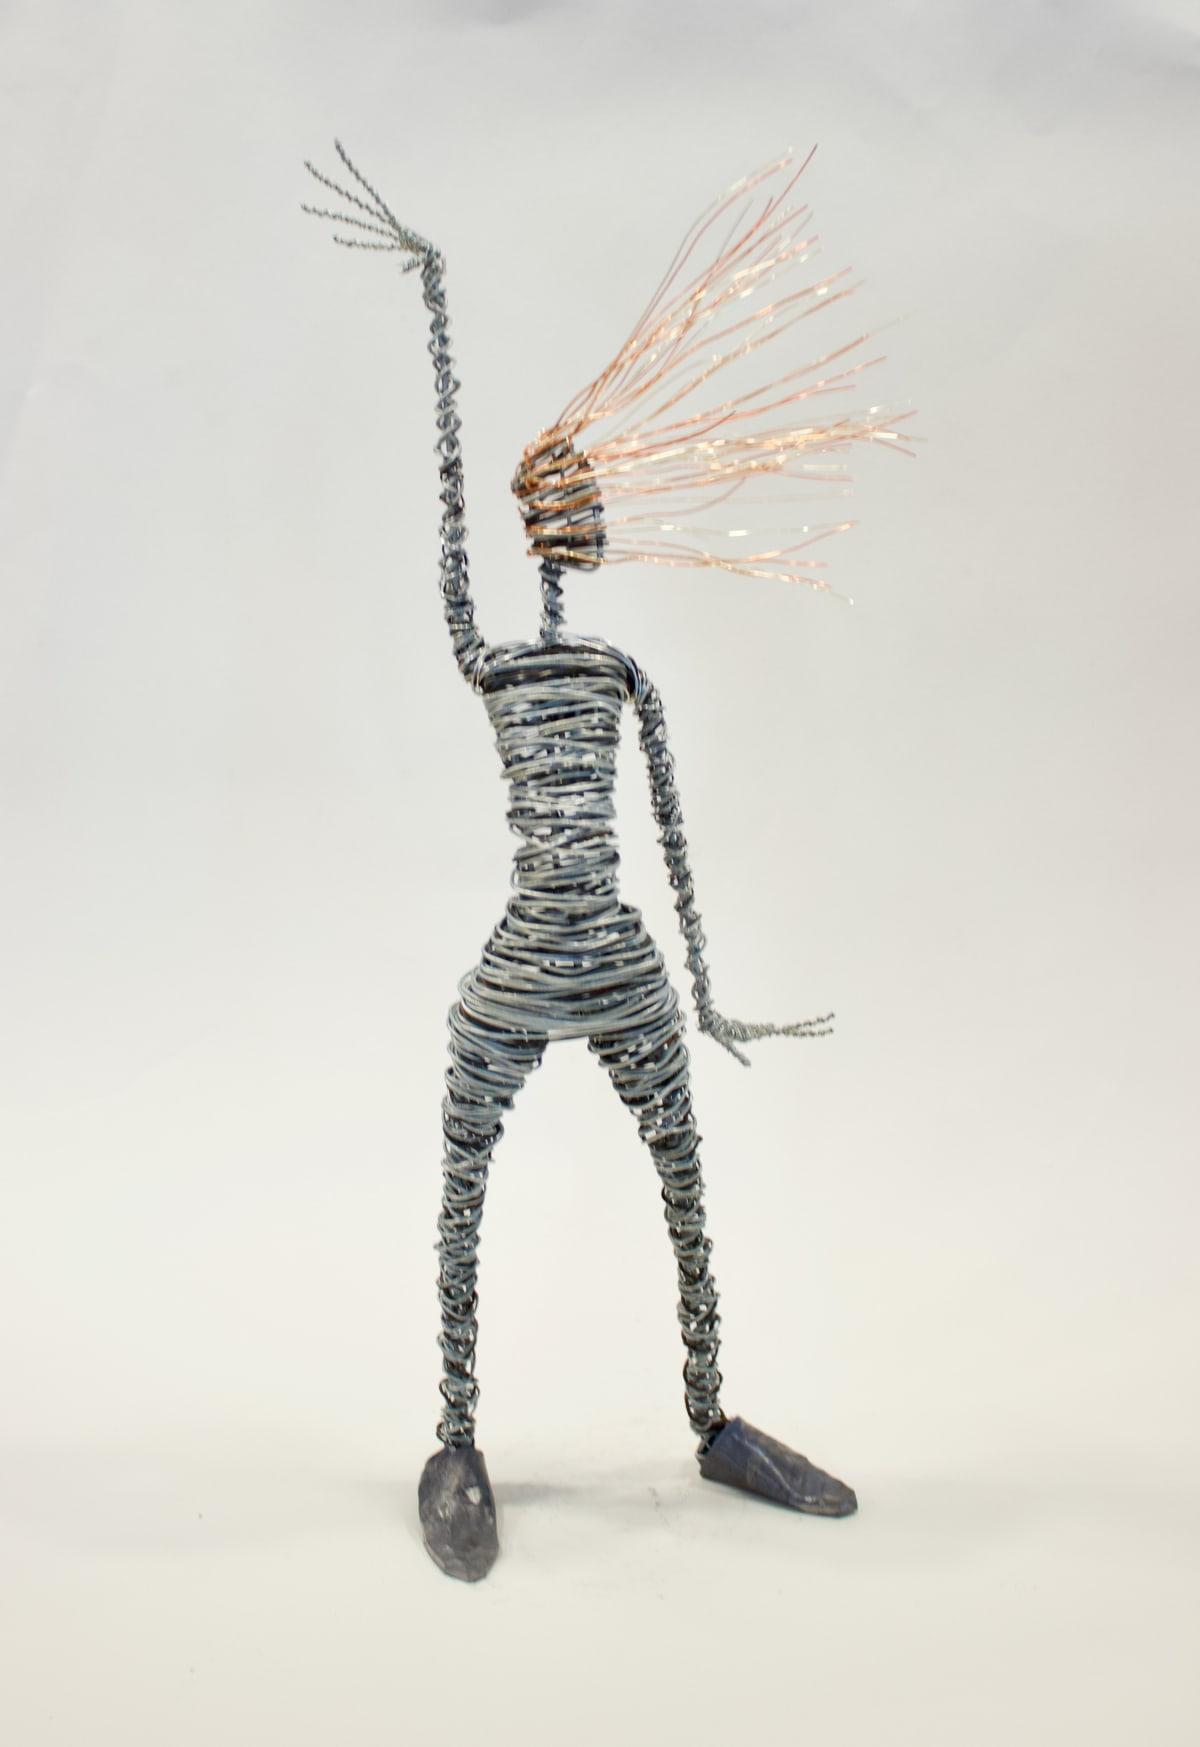 Rachel Ducker Arm Up, 2019 Wire Sculpture 45 x 20 x 10 cm 17 3/4 x 7 7/8 x 4 in